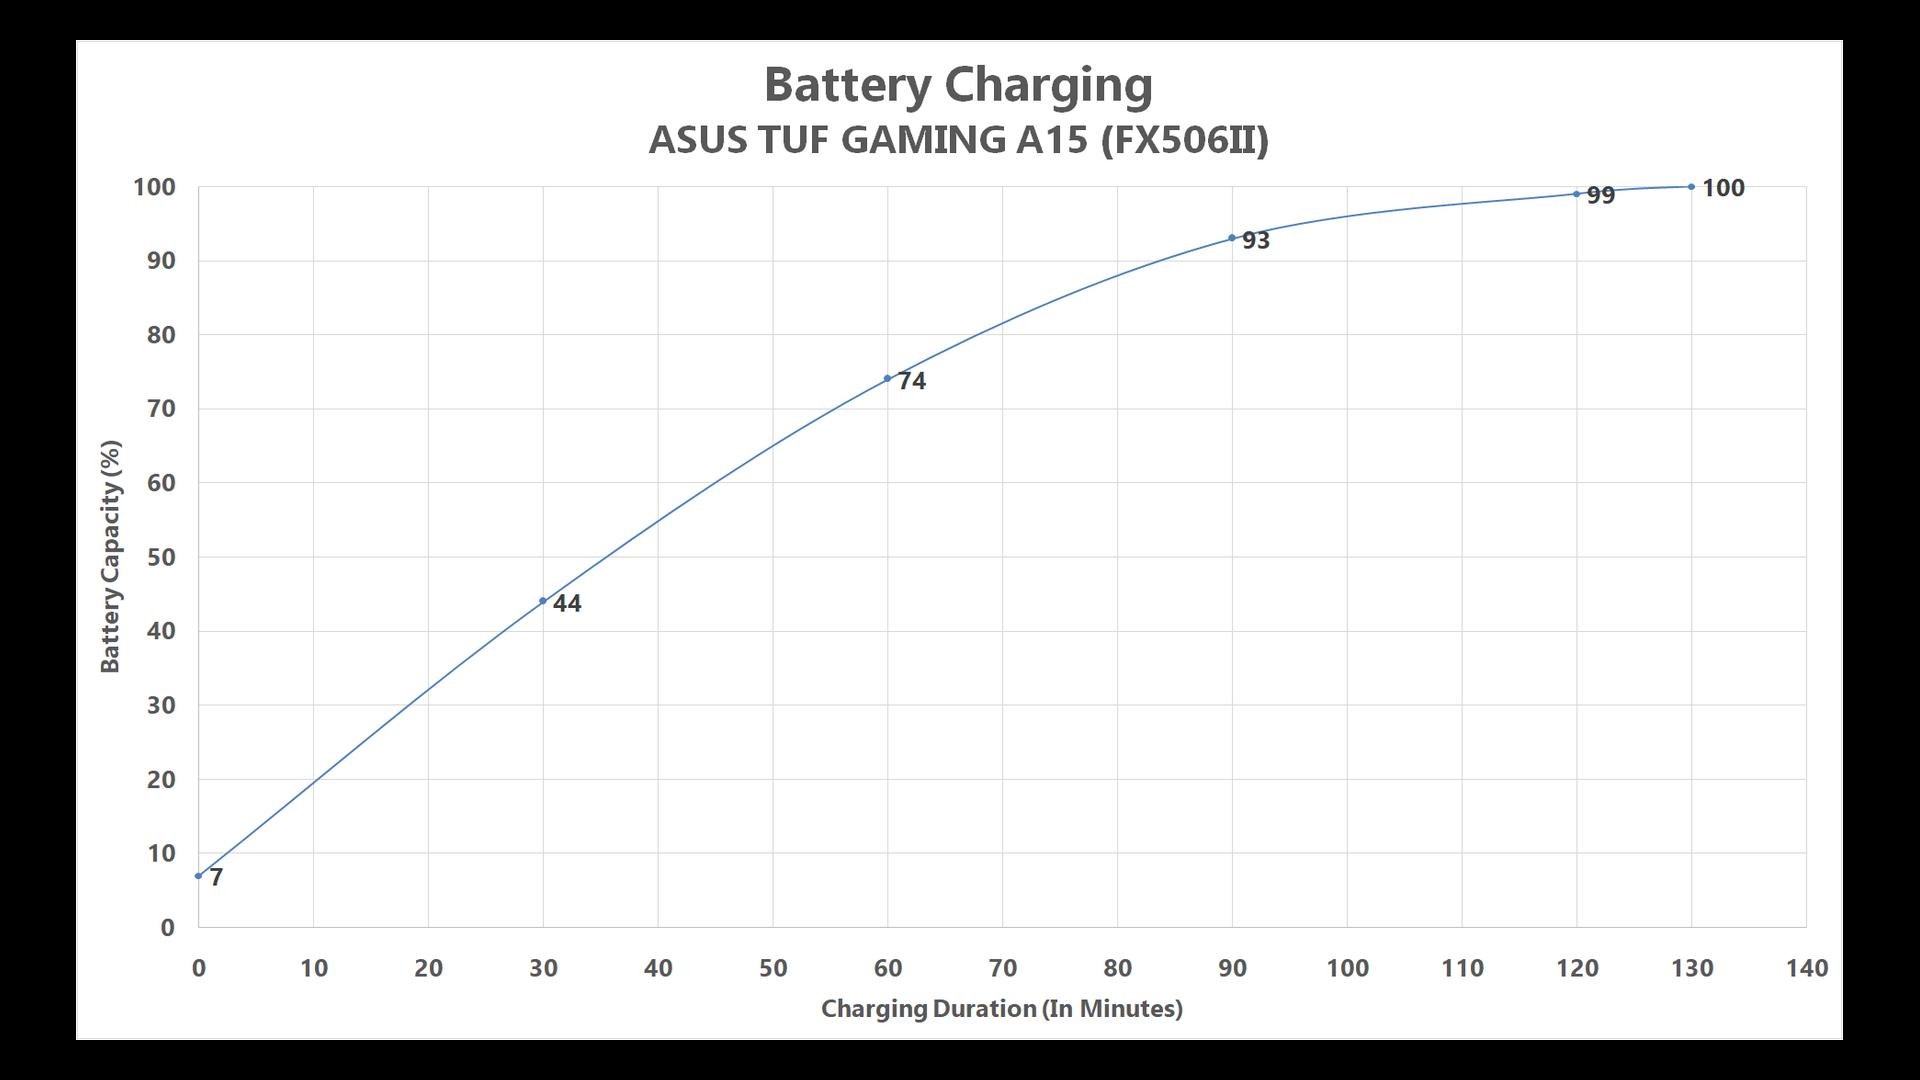 baterai charge